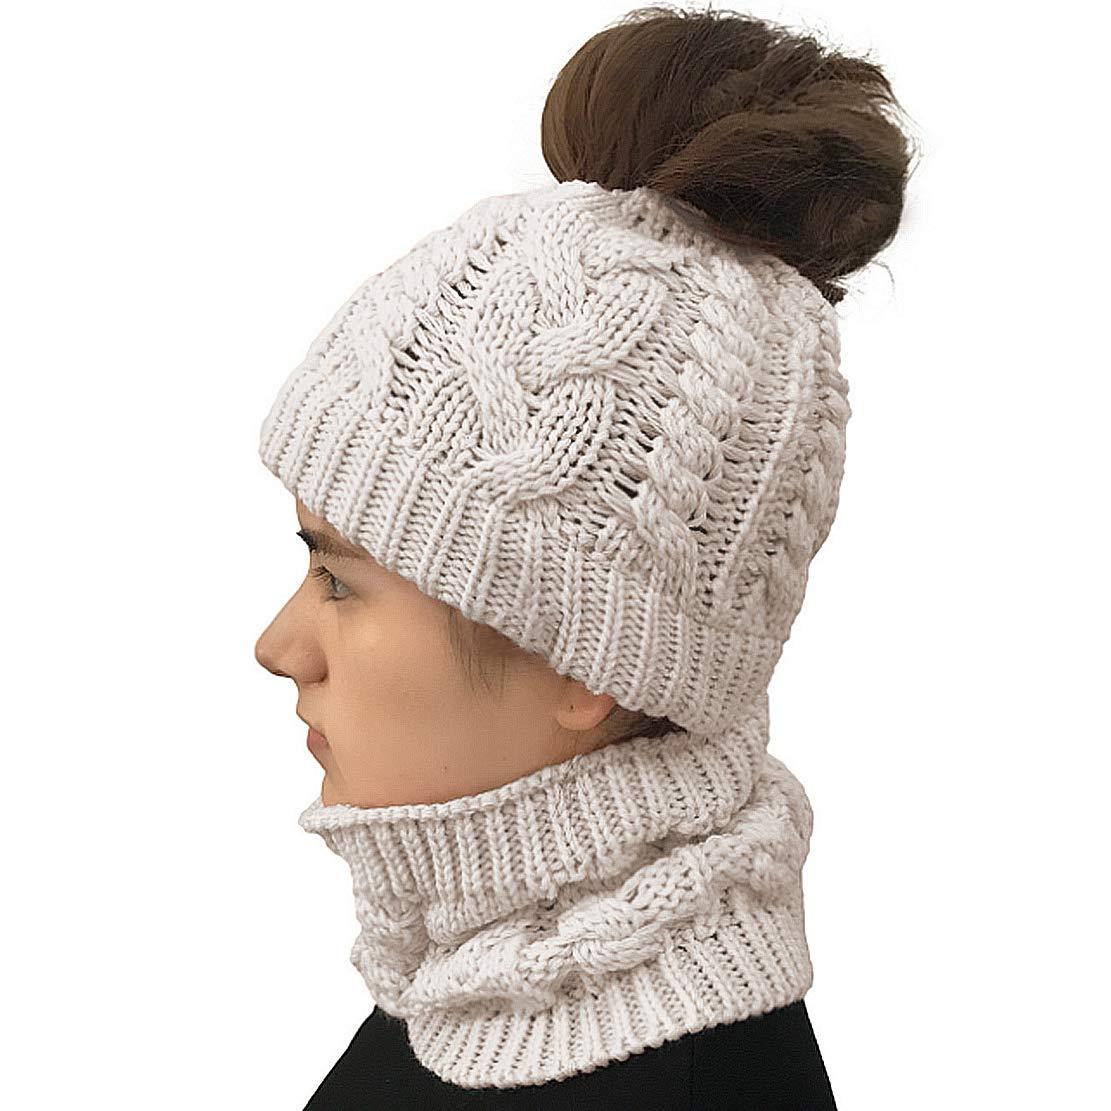 e5e0cd8c2df10 ... Warm Knit Messy High Bun Ponytail Visor Beanie Cap  12.99. Click ...